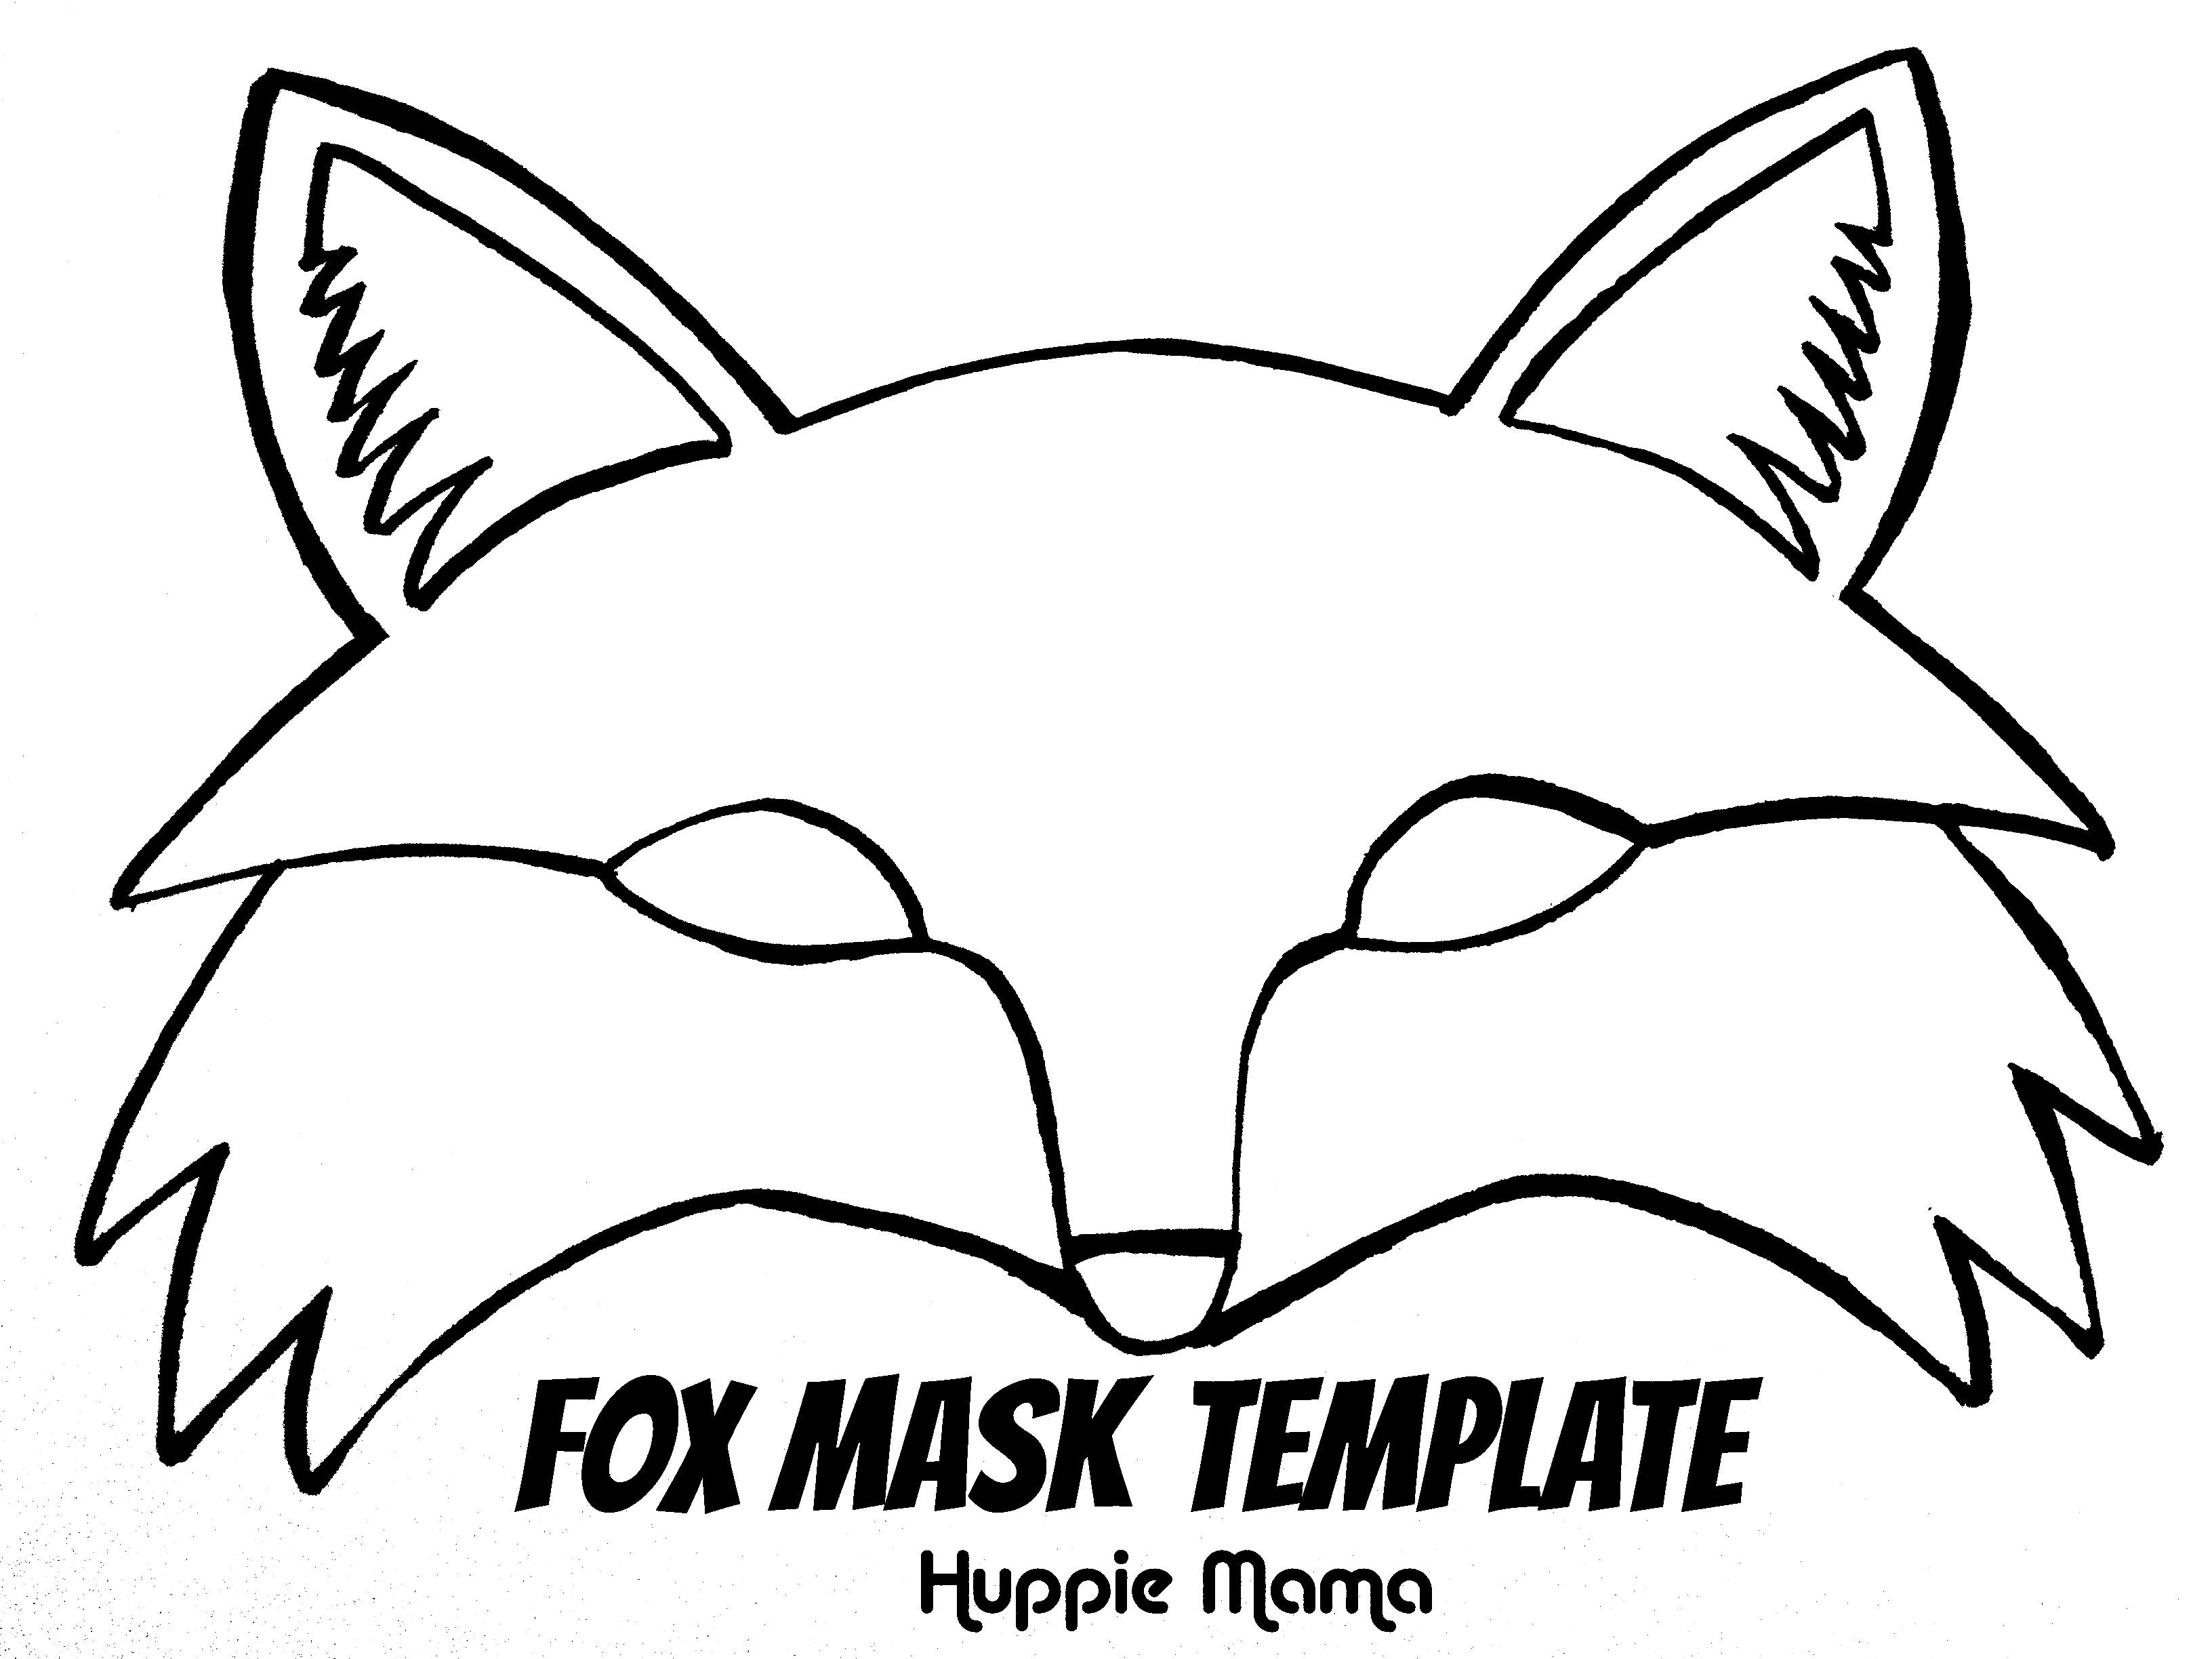 Fox Mask Template   Wood Work   Fox Mask, Fantastic Mr Fox, Mr Fox - Free Printable Fox Mask Template